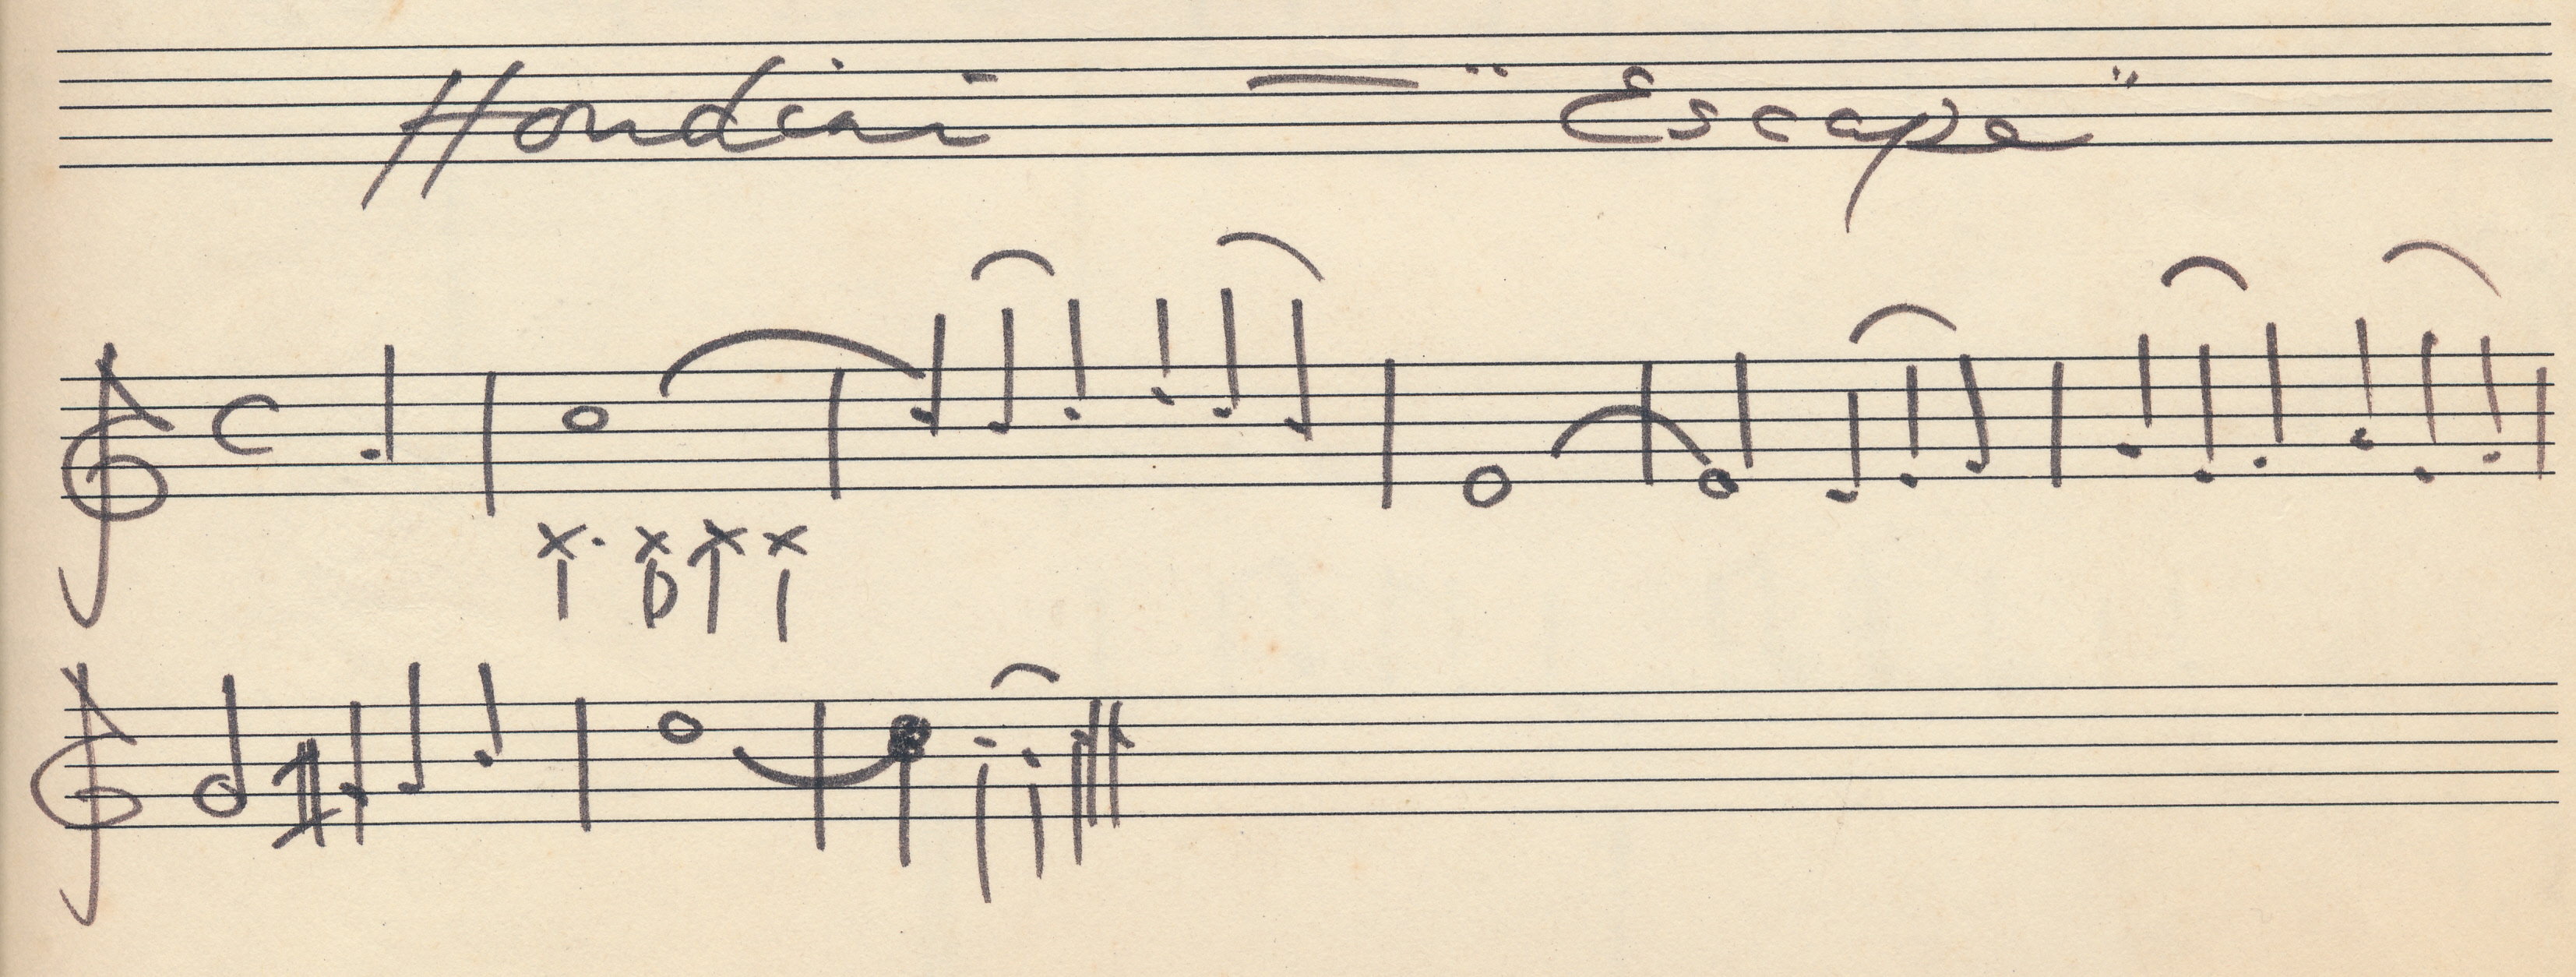 Anthony Burgess music